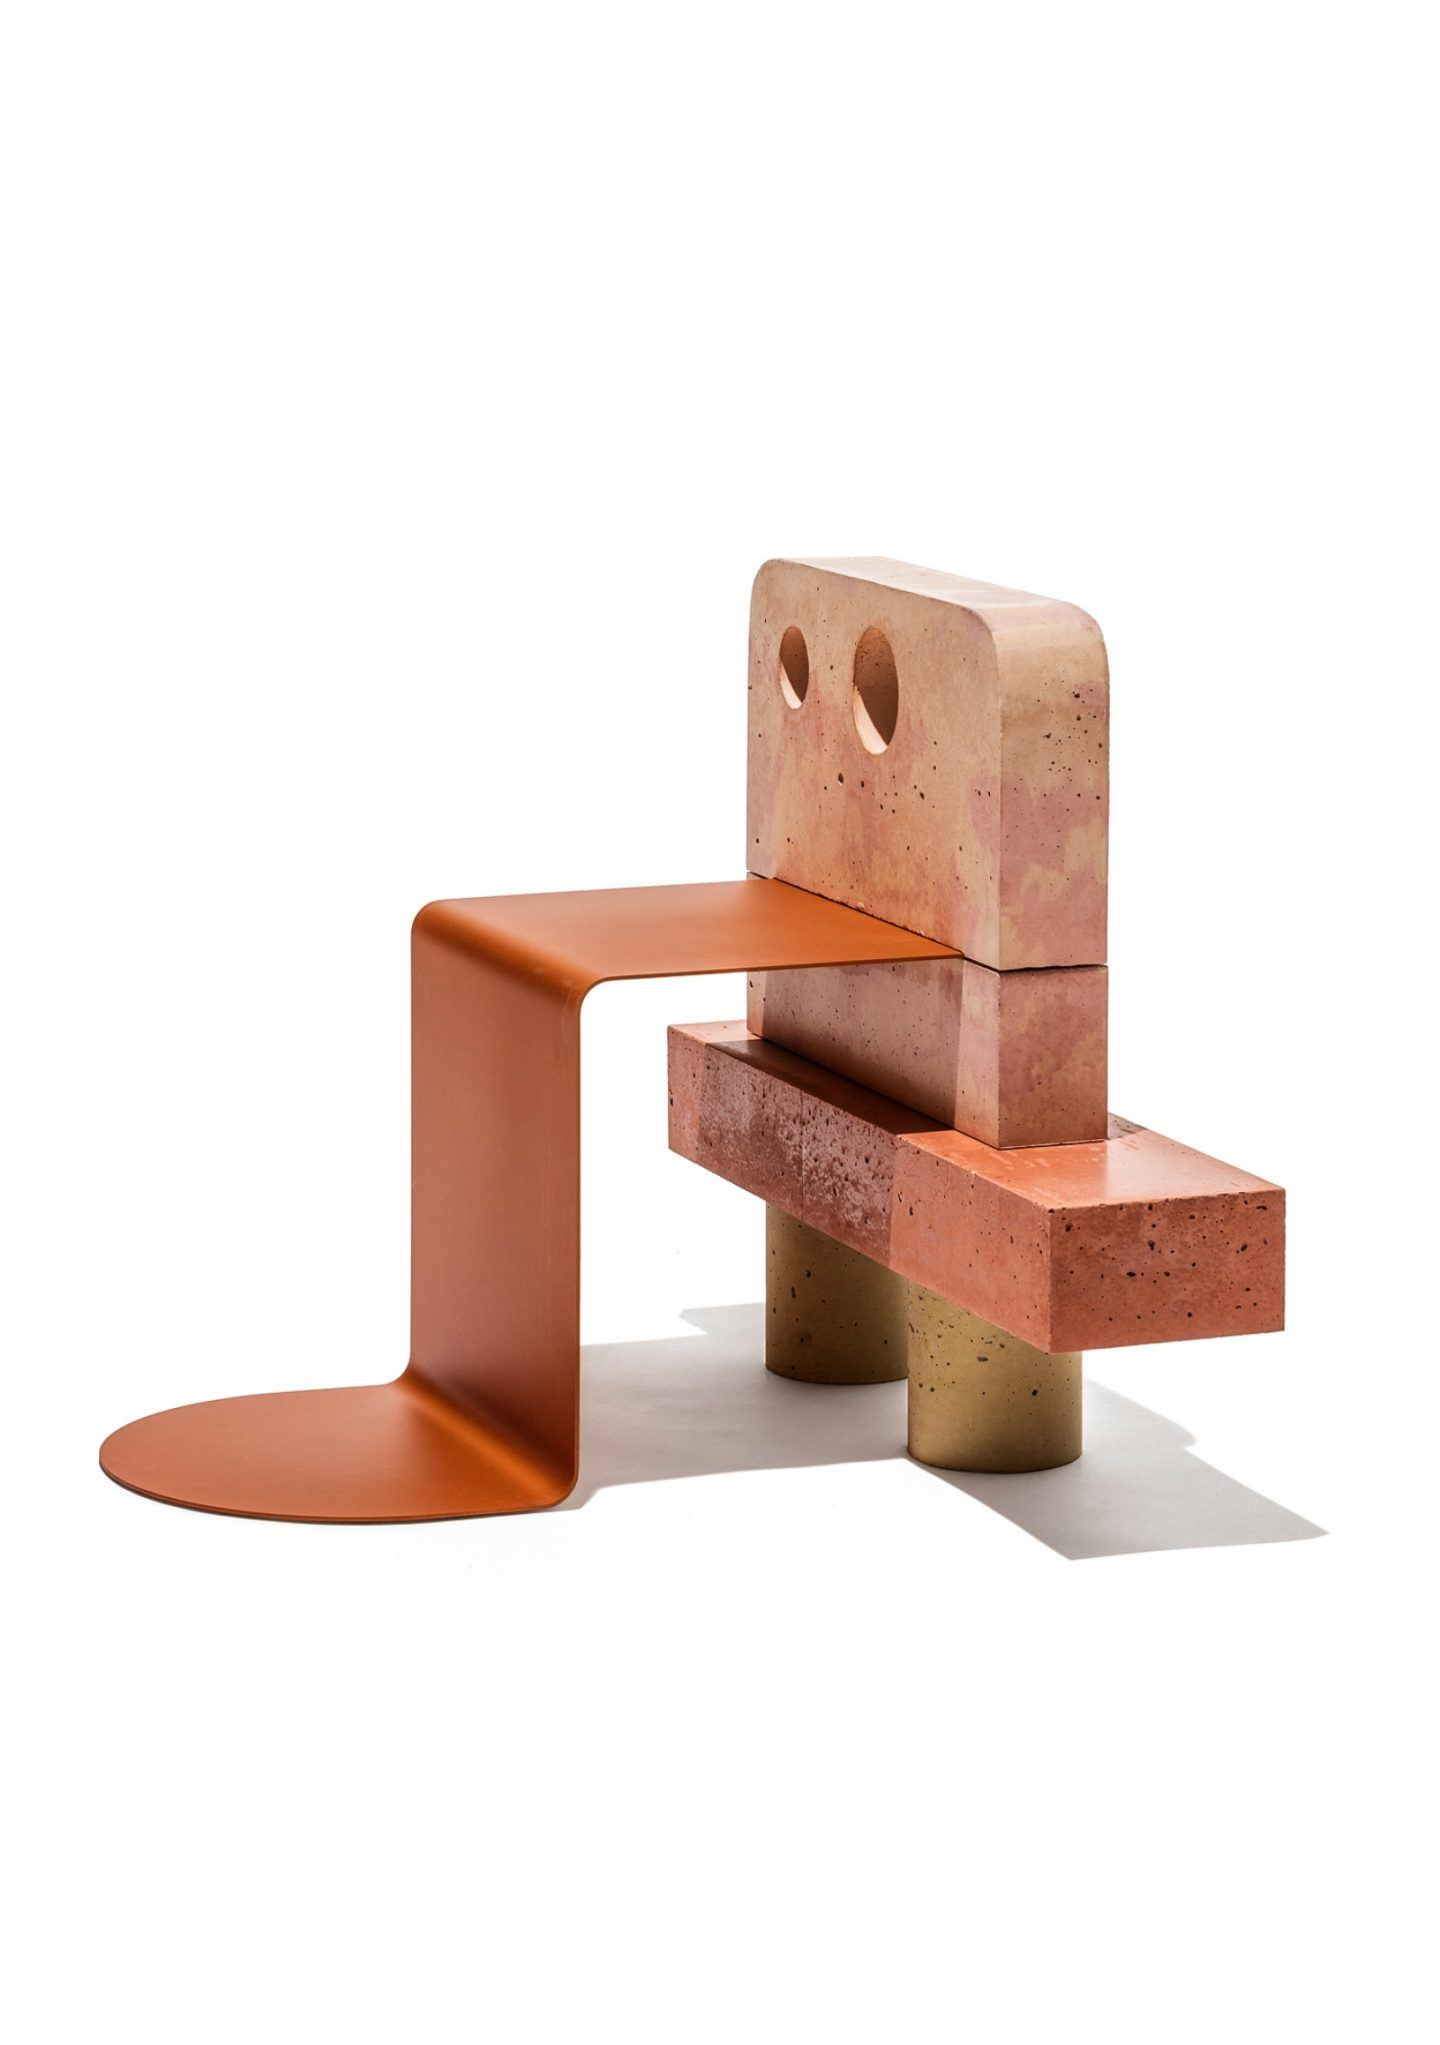 IGNANT-Design-Pettersen-Hein-010